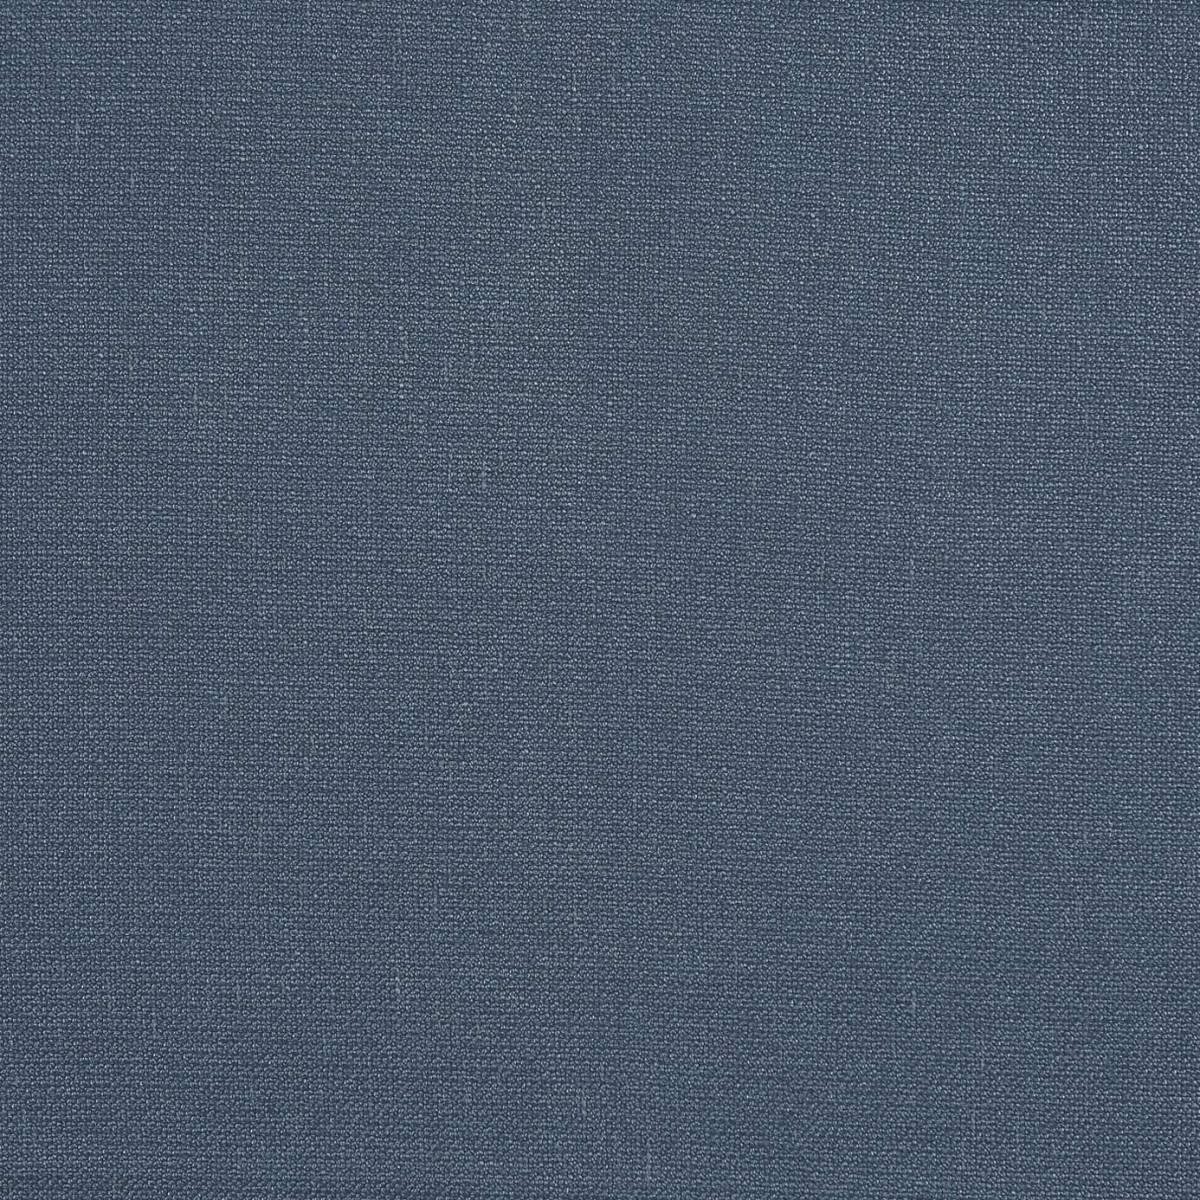 Soul Fabric Indigo 7164 705 Prestigious Textiles